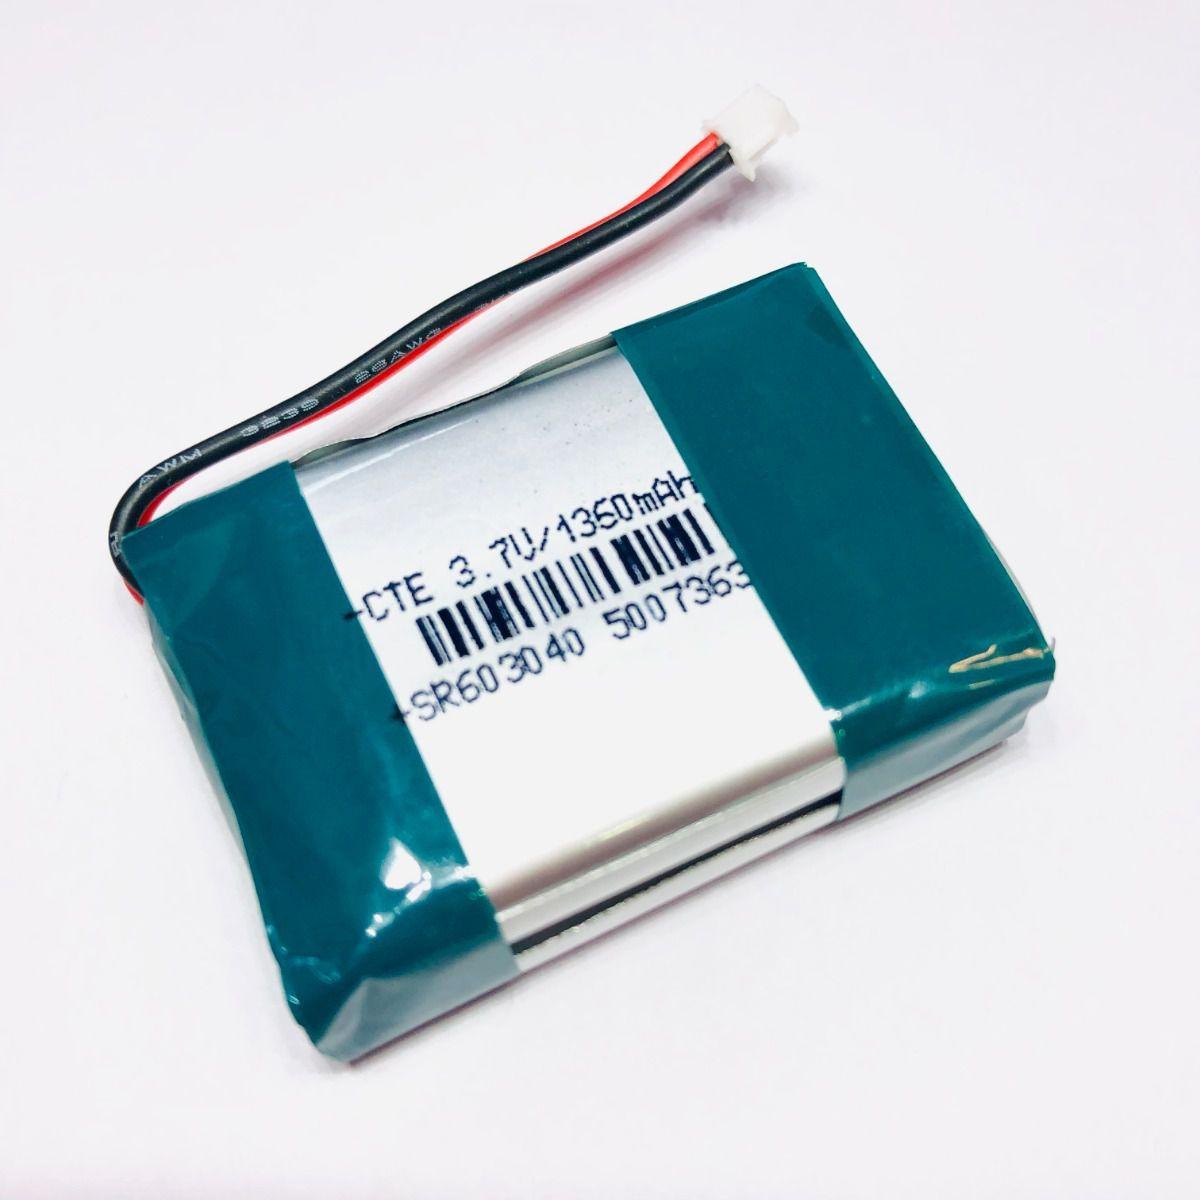 Bateria Li-po 3,7v 1360mah 2s 42x30x12mm Recarregável Pcb